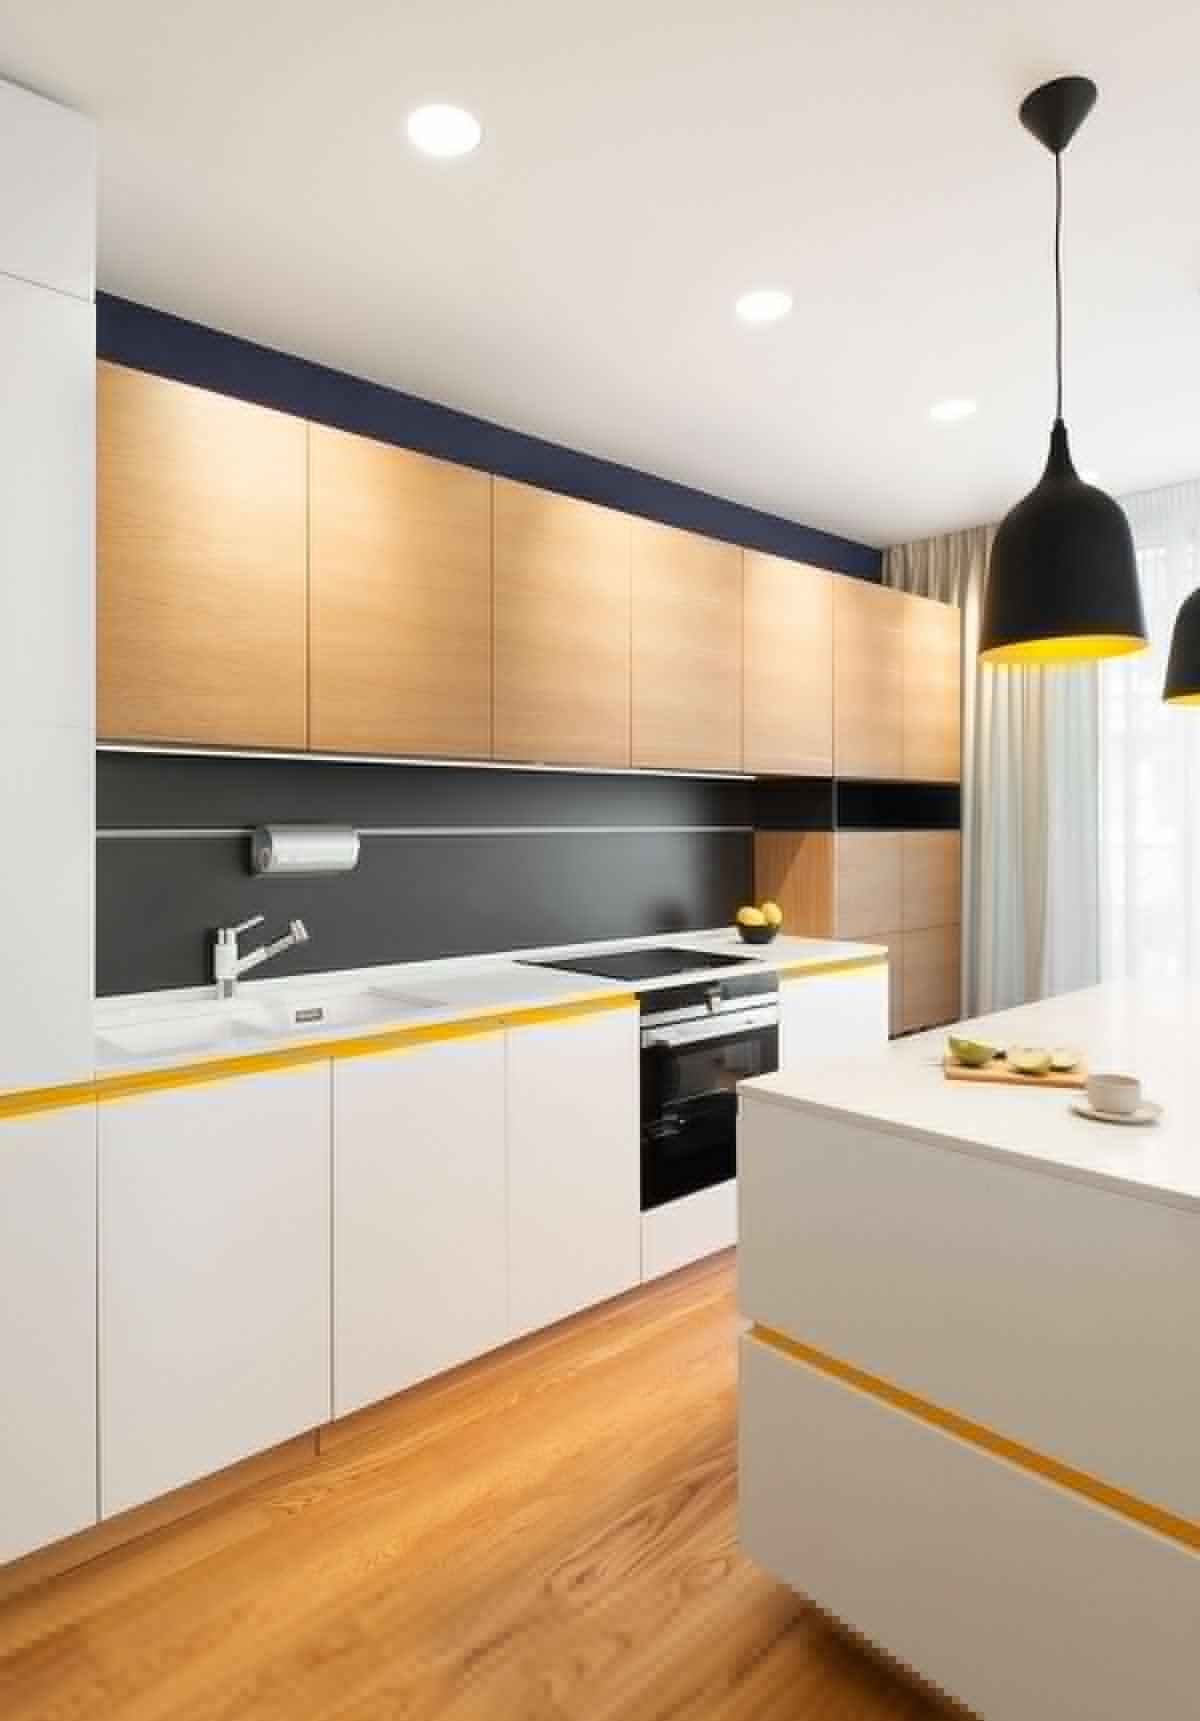 Receiving Room Interior Design: Kitchen Interior Design (Modern, Simple And Best Color